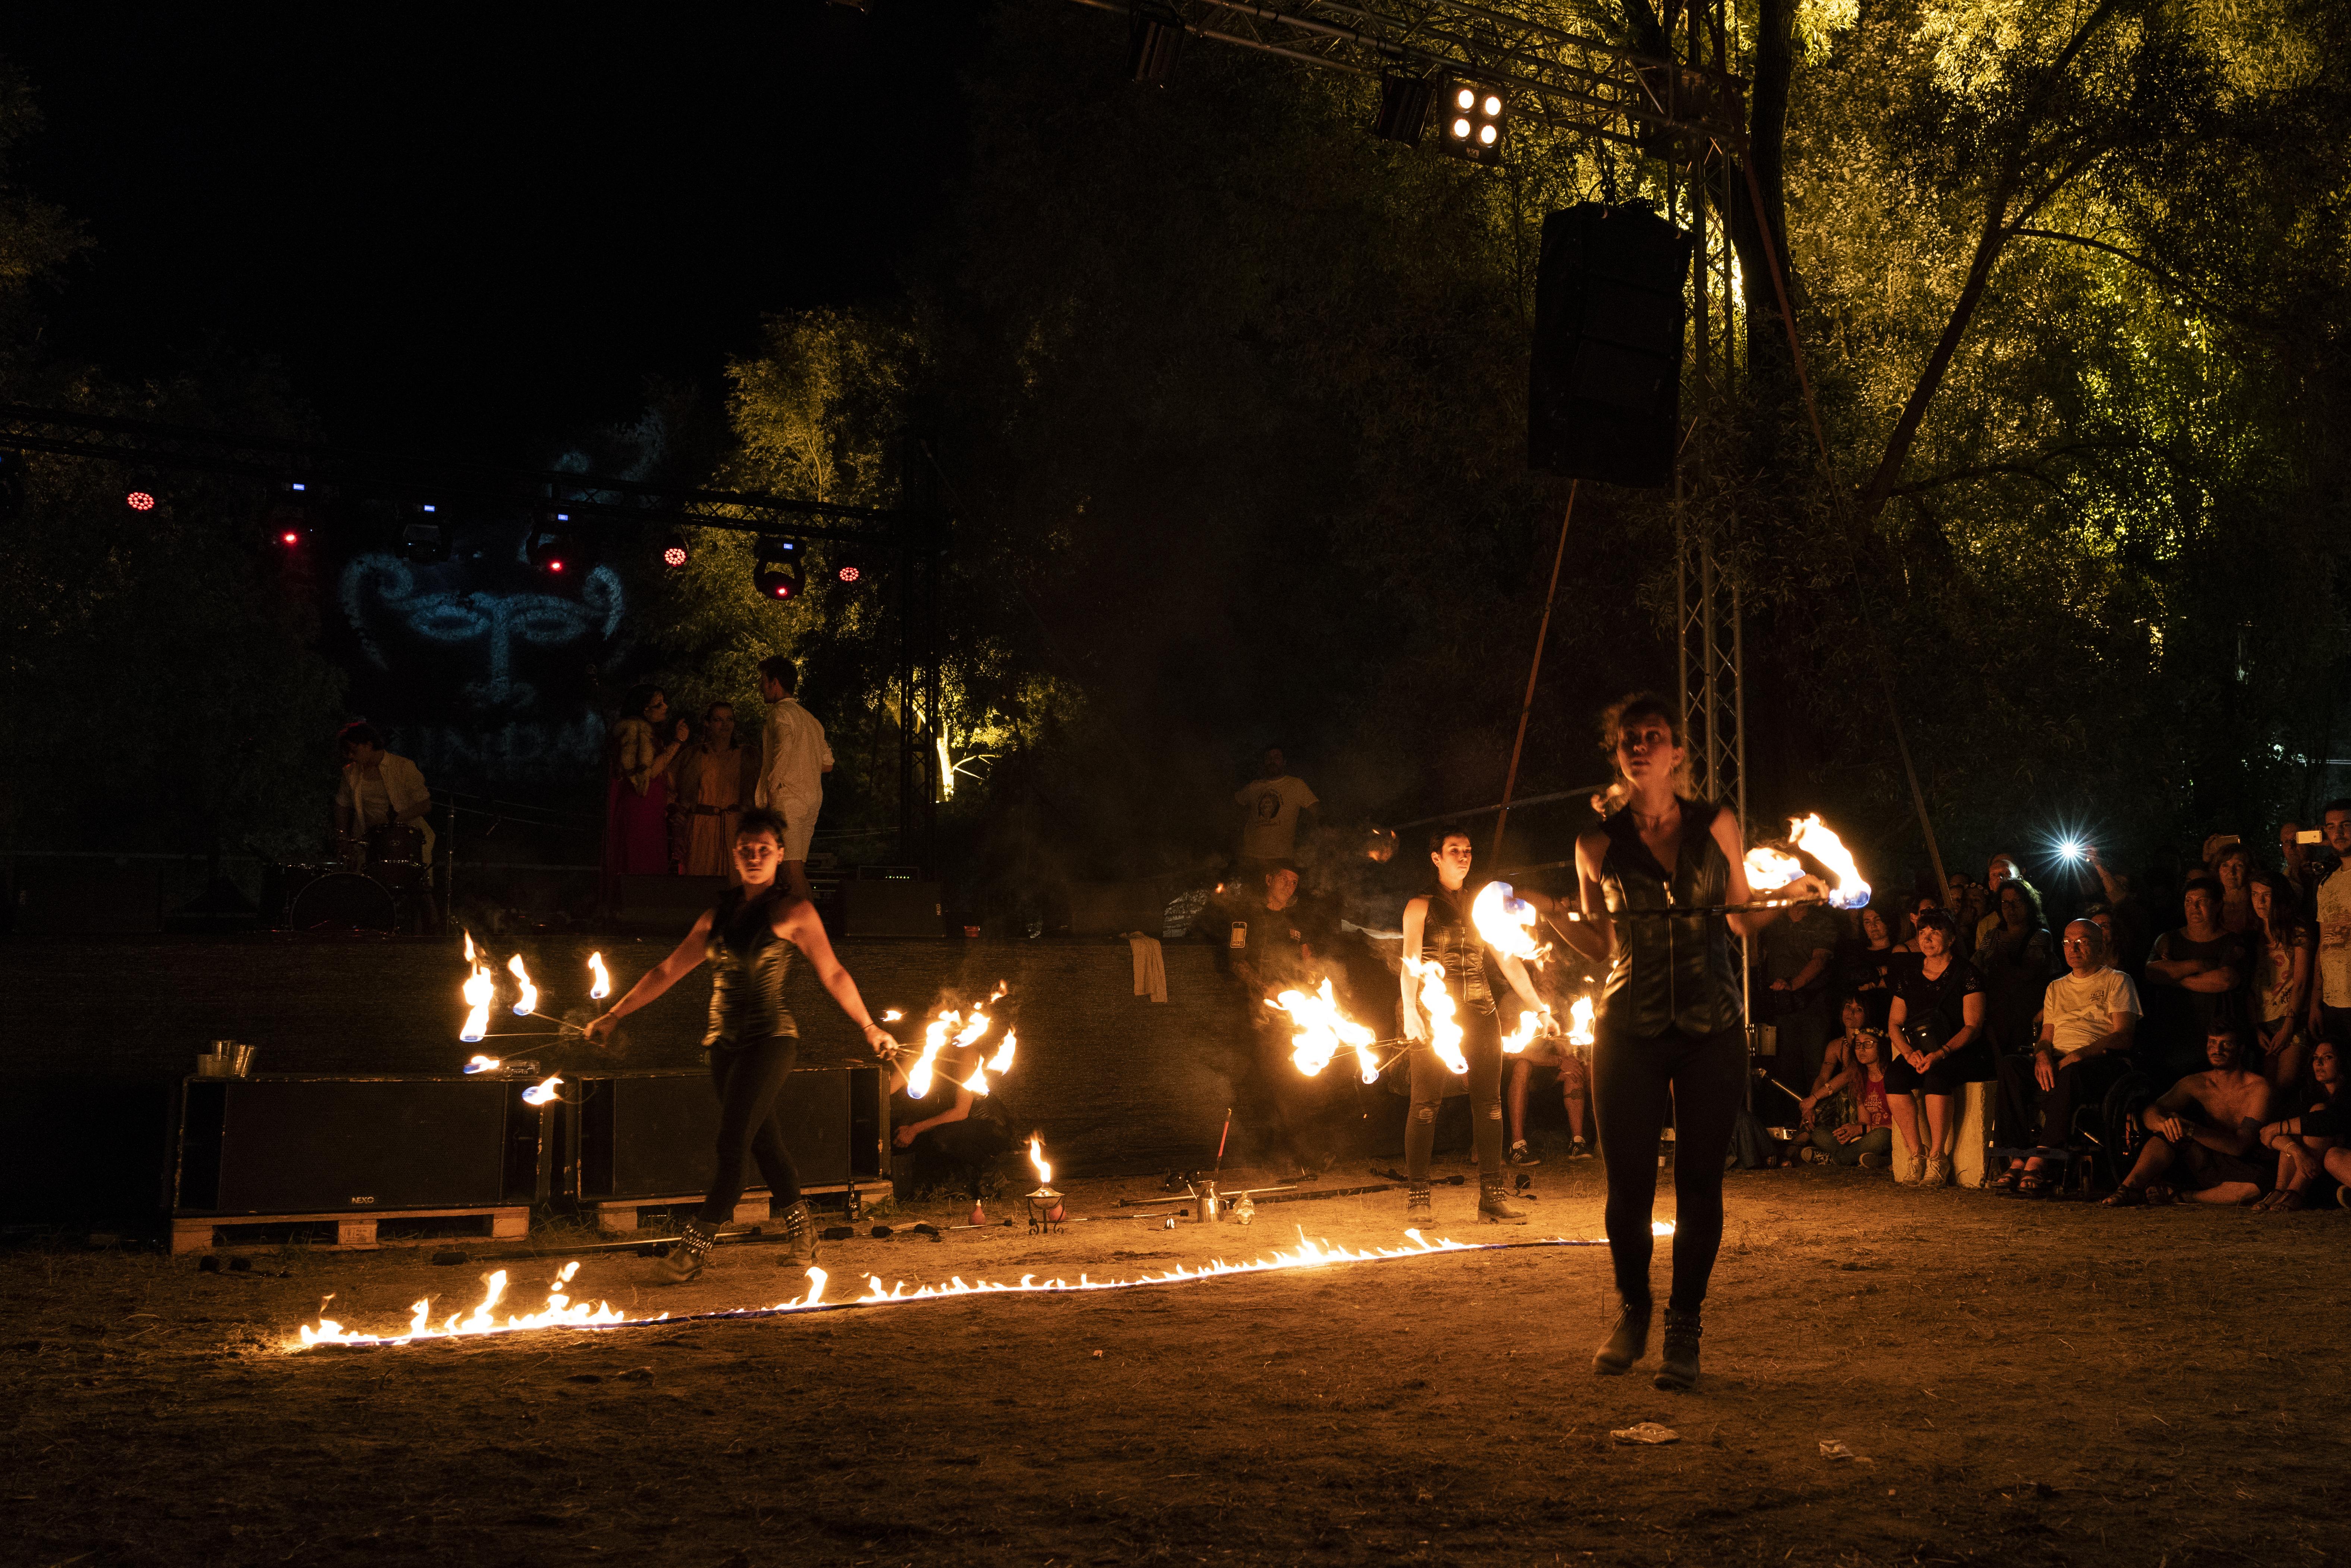 strie fire show - Festival